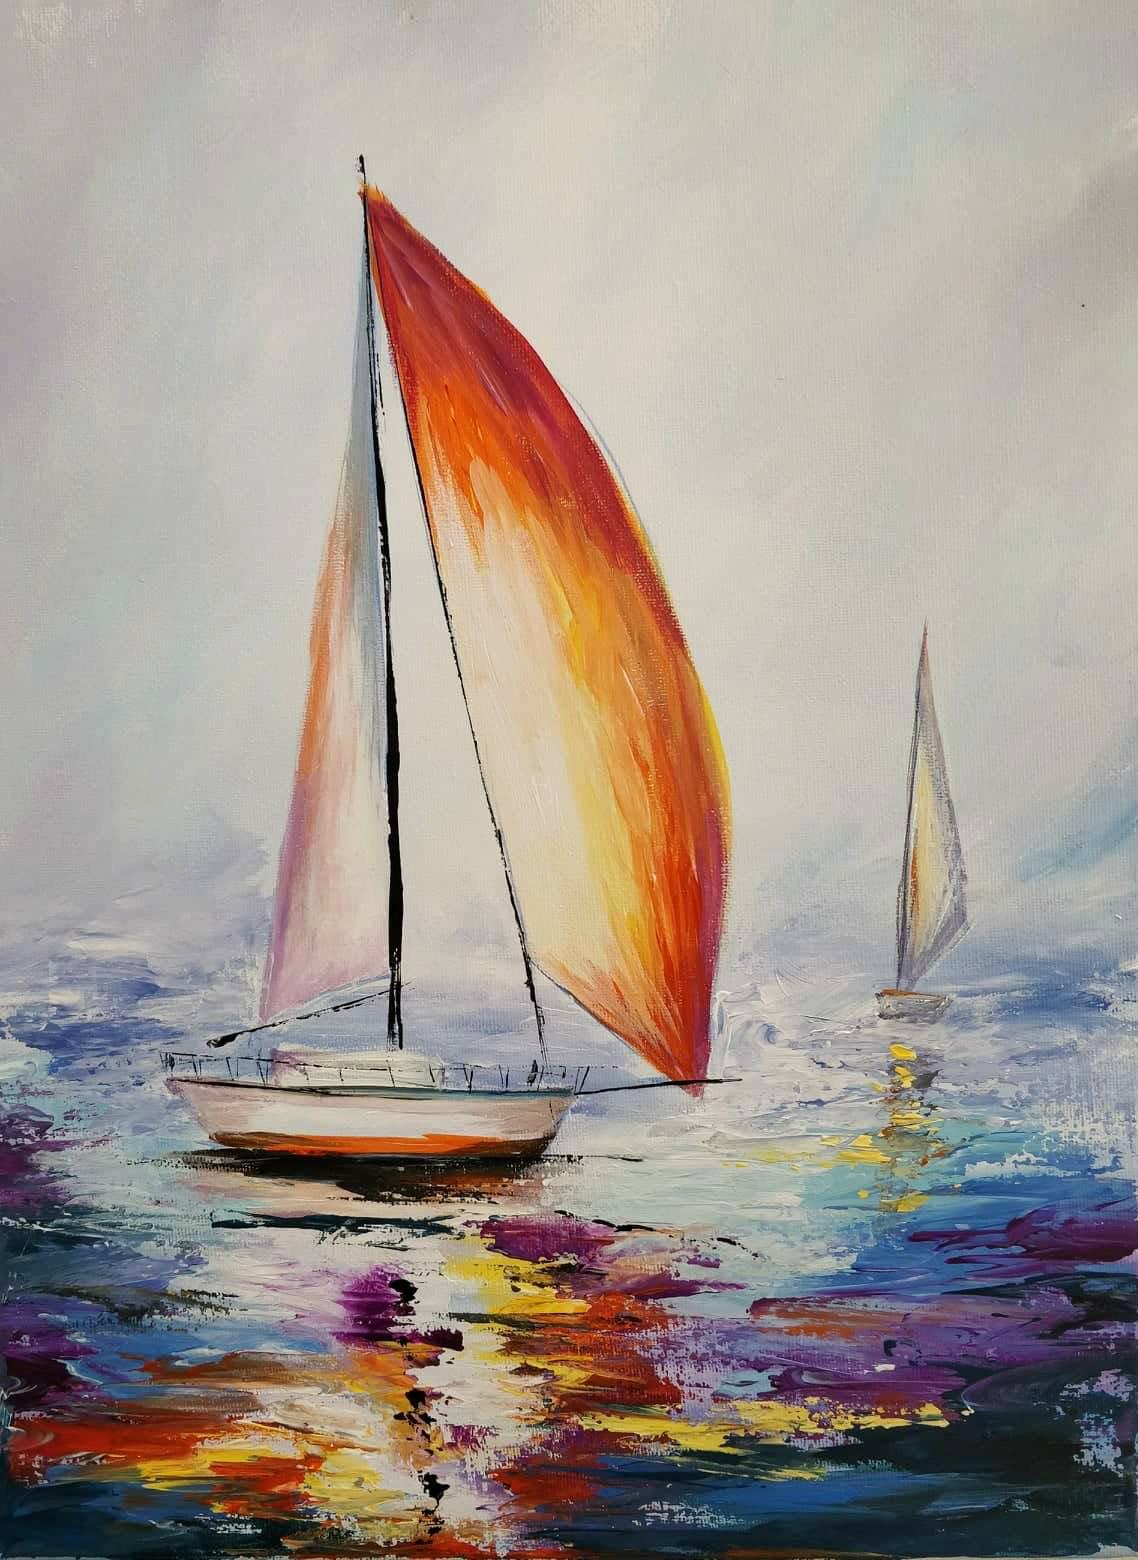 paintclub sail away